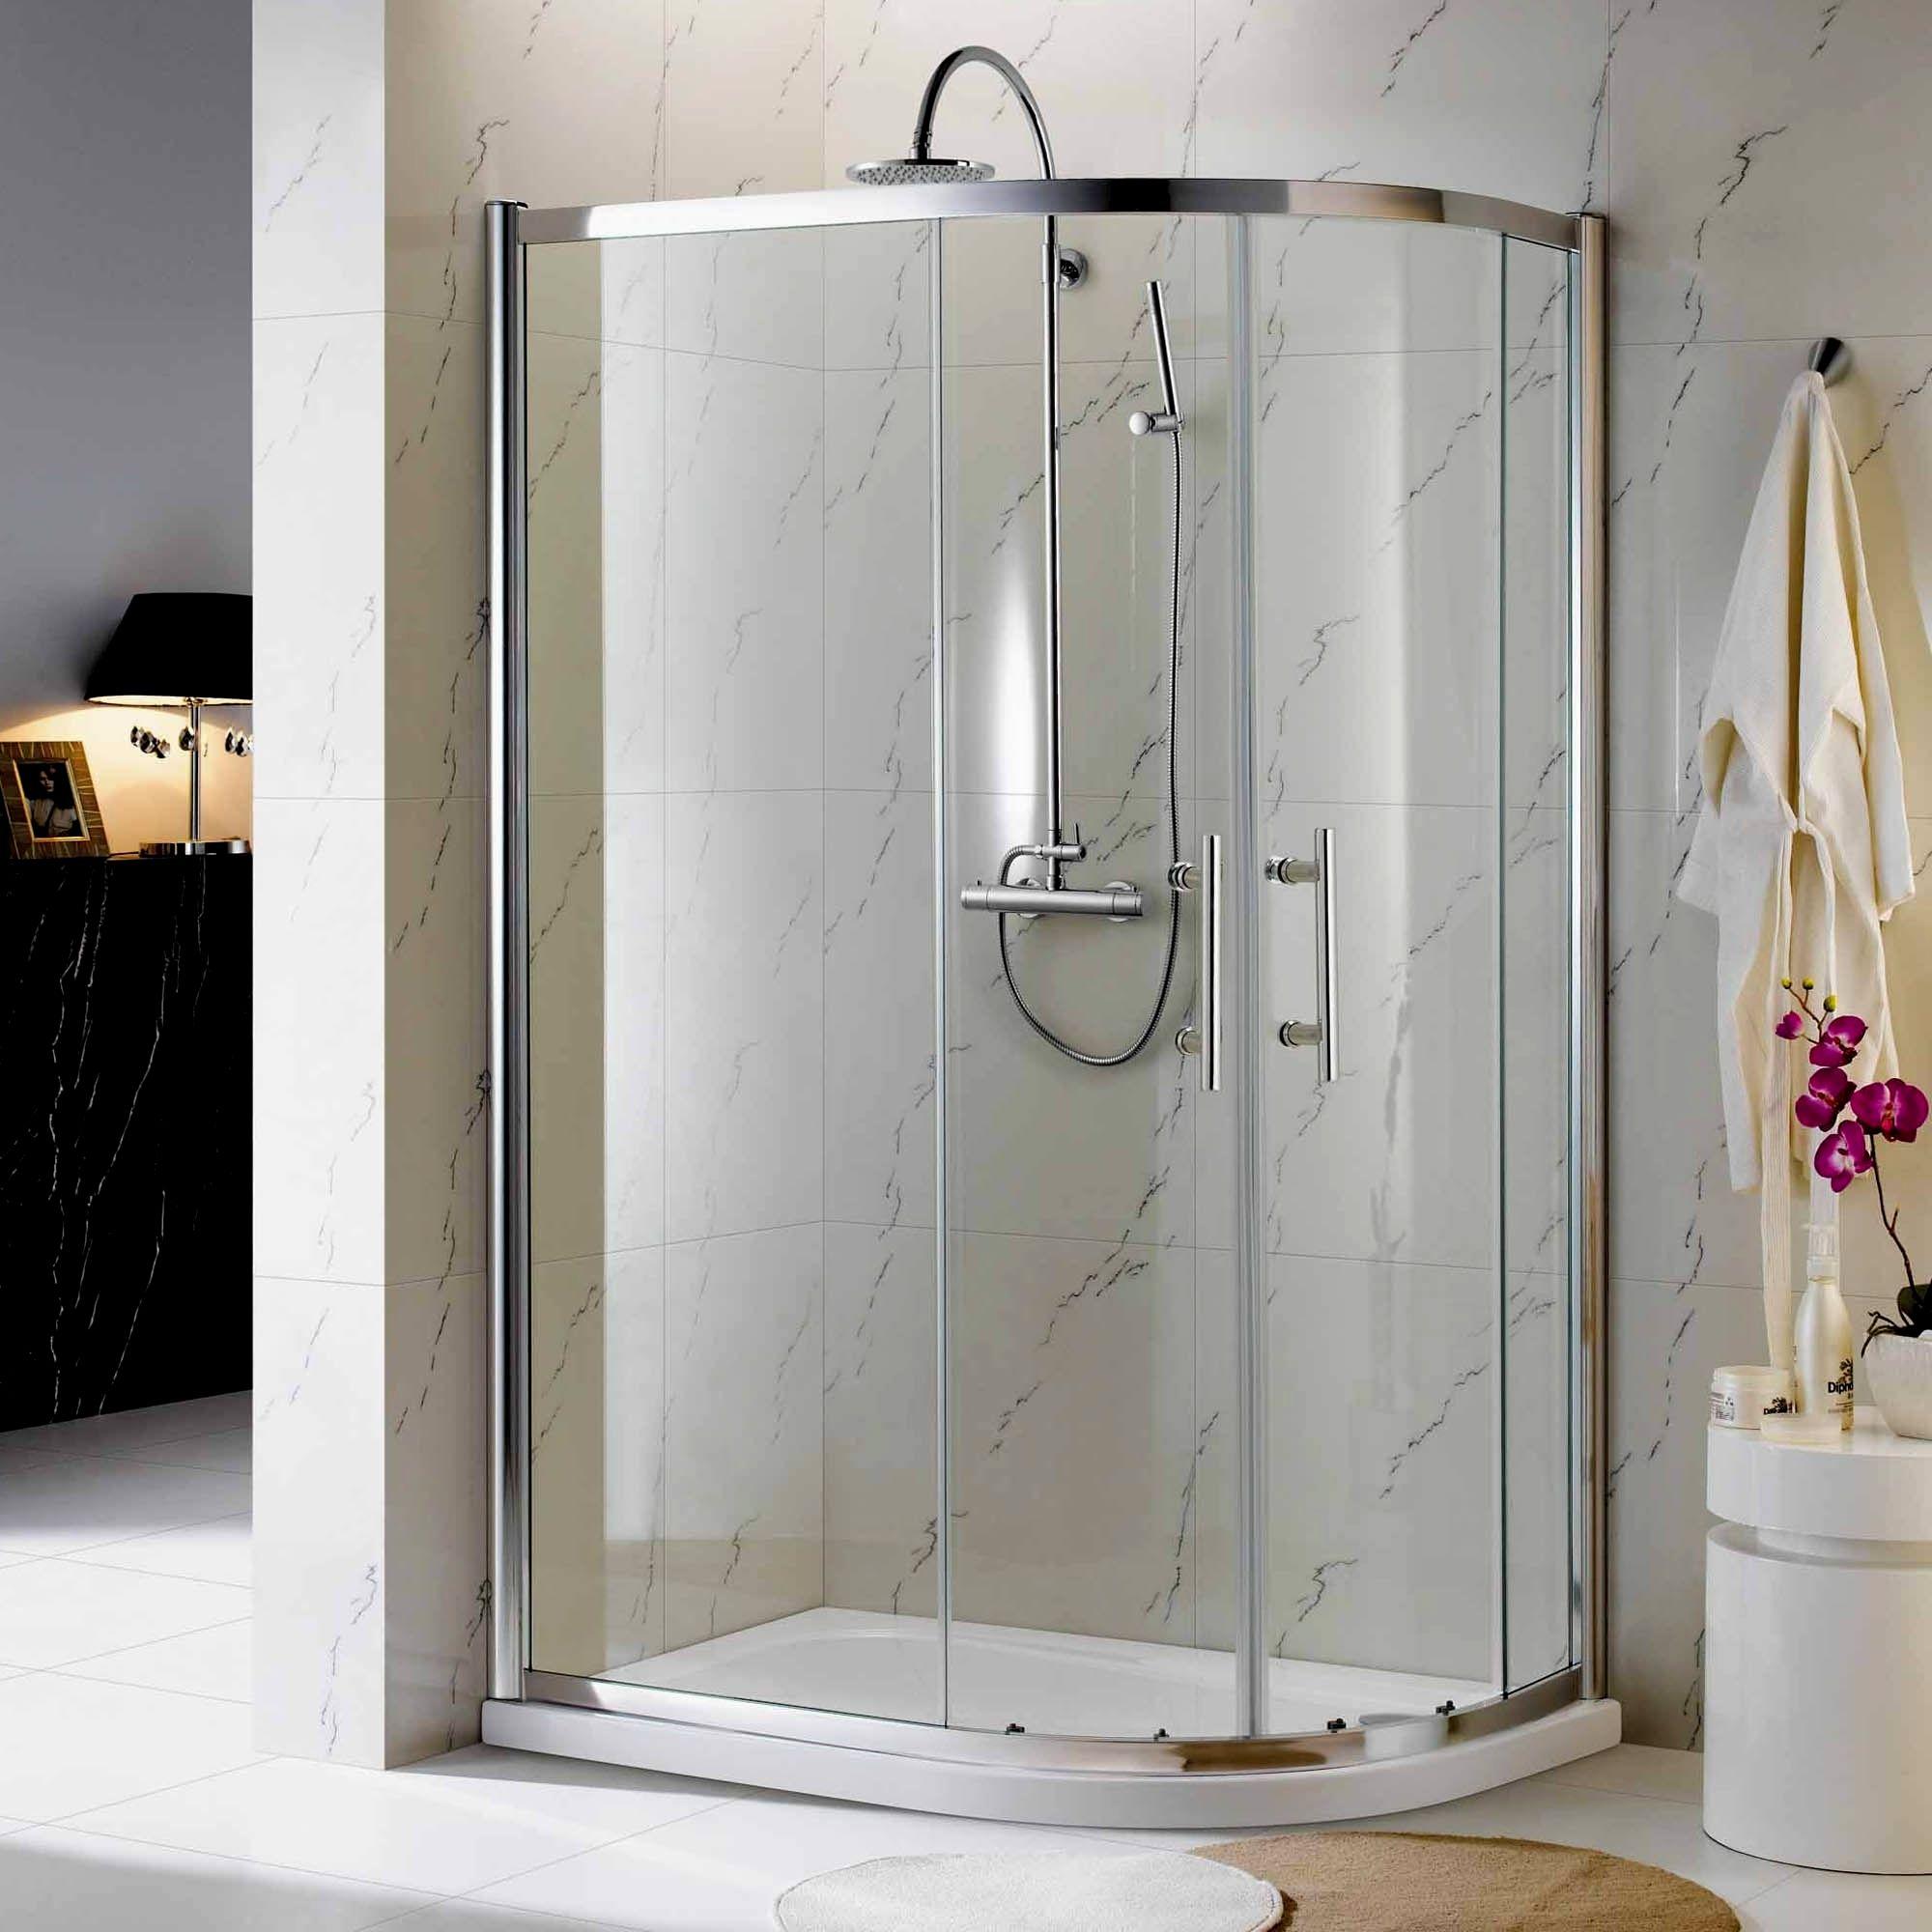 contemporary bathroom stall hardware ideas-New Bathroom Stall Hardware Online